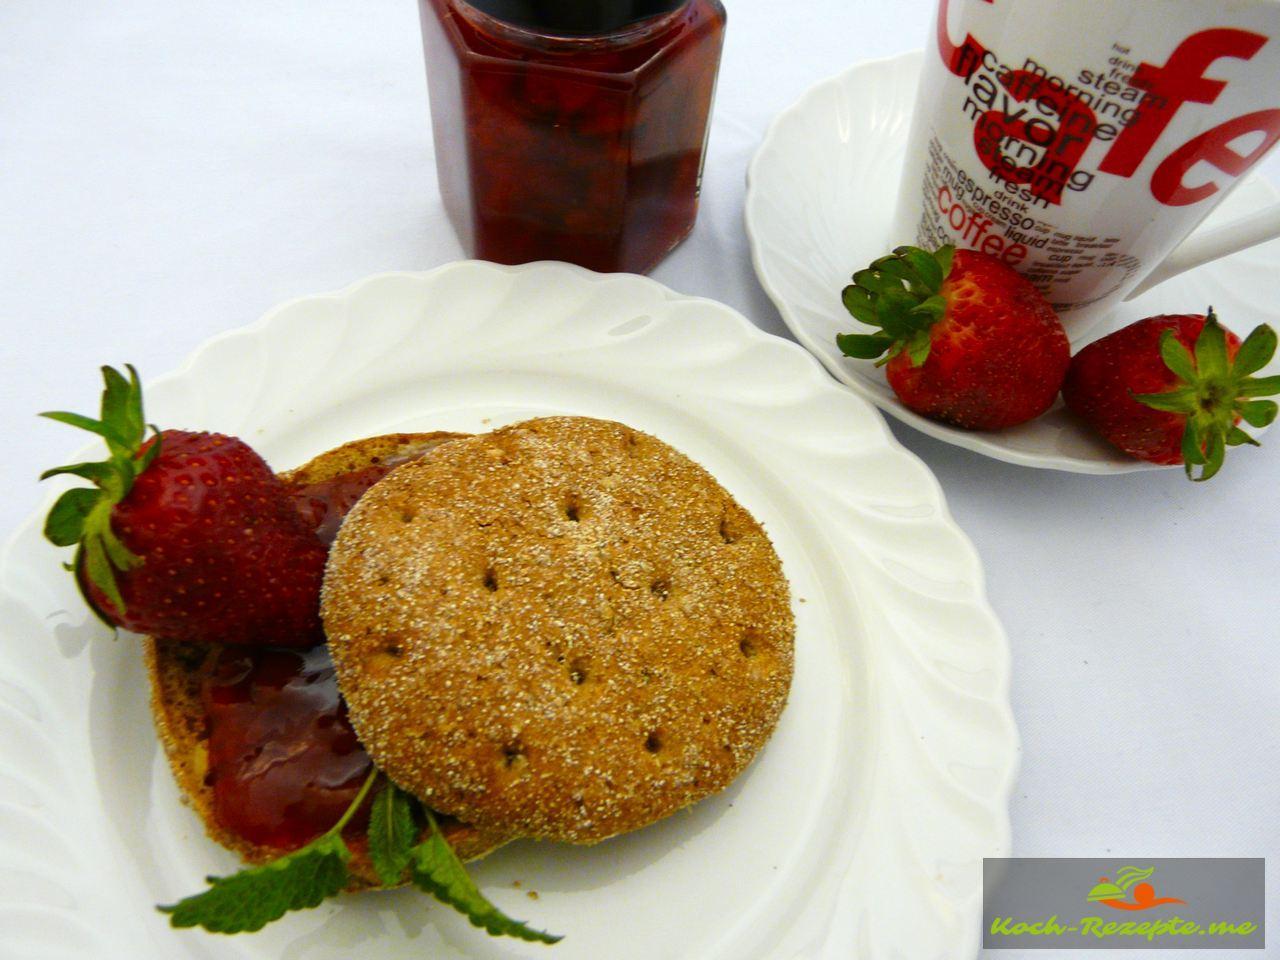 Brotaufstrich würzige Marmelade